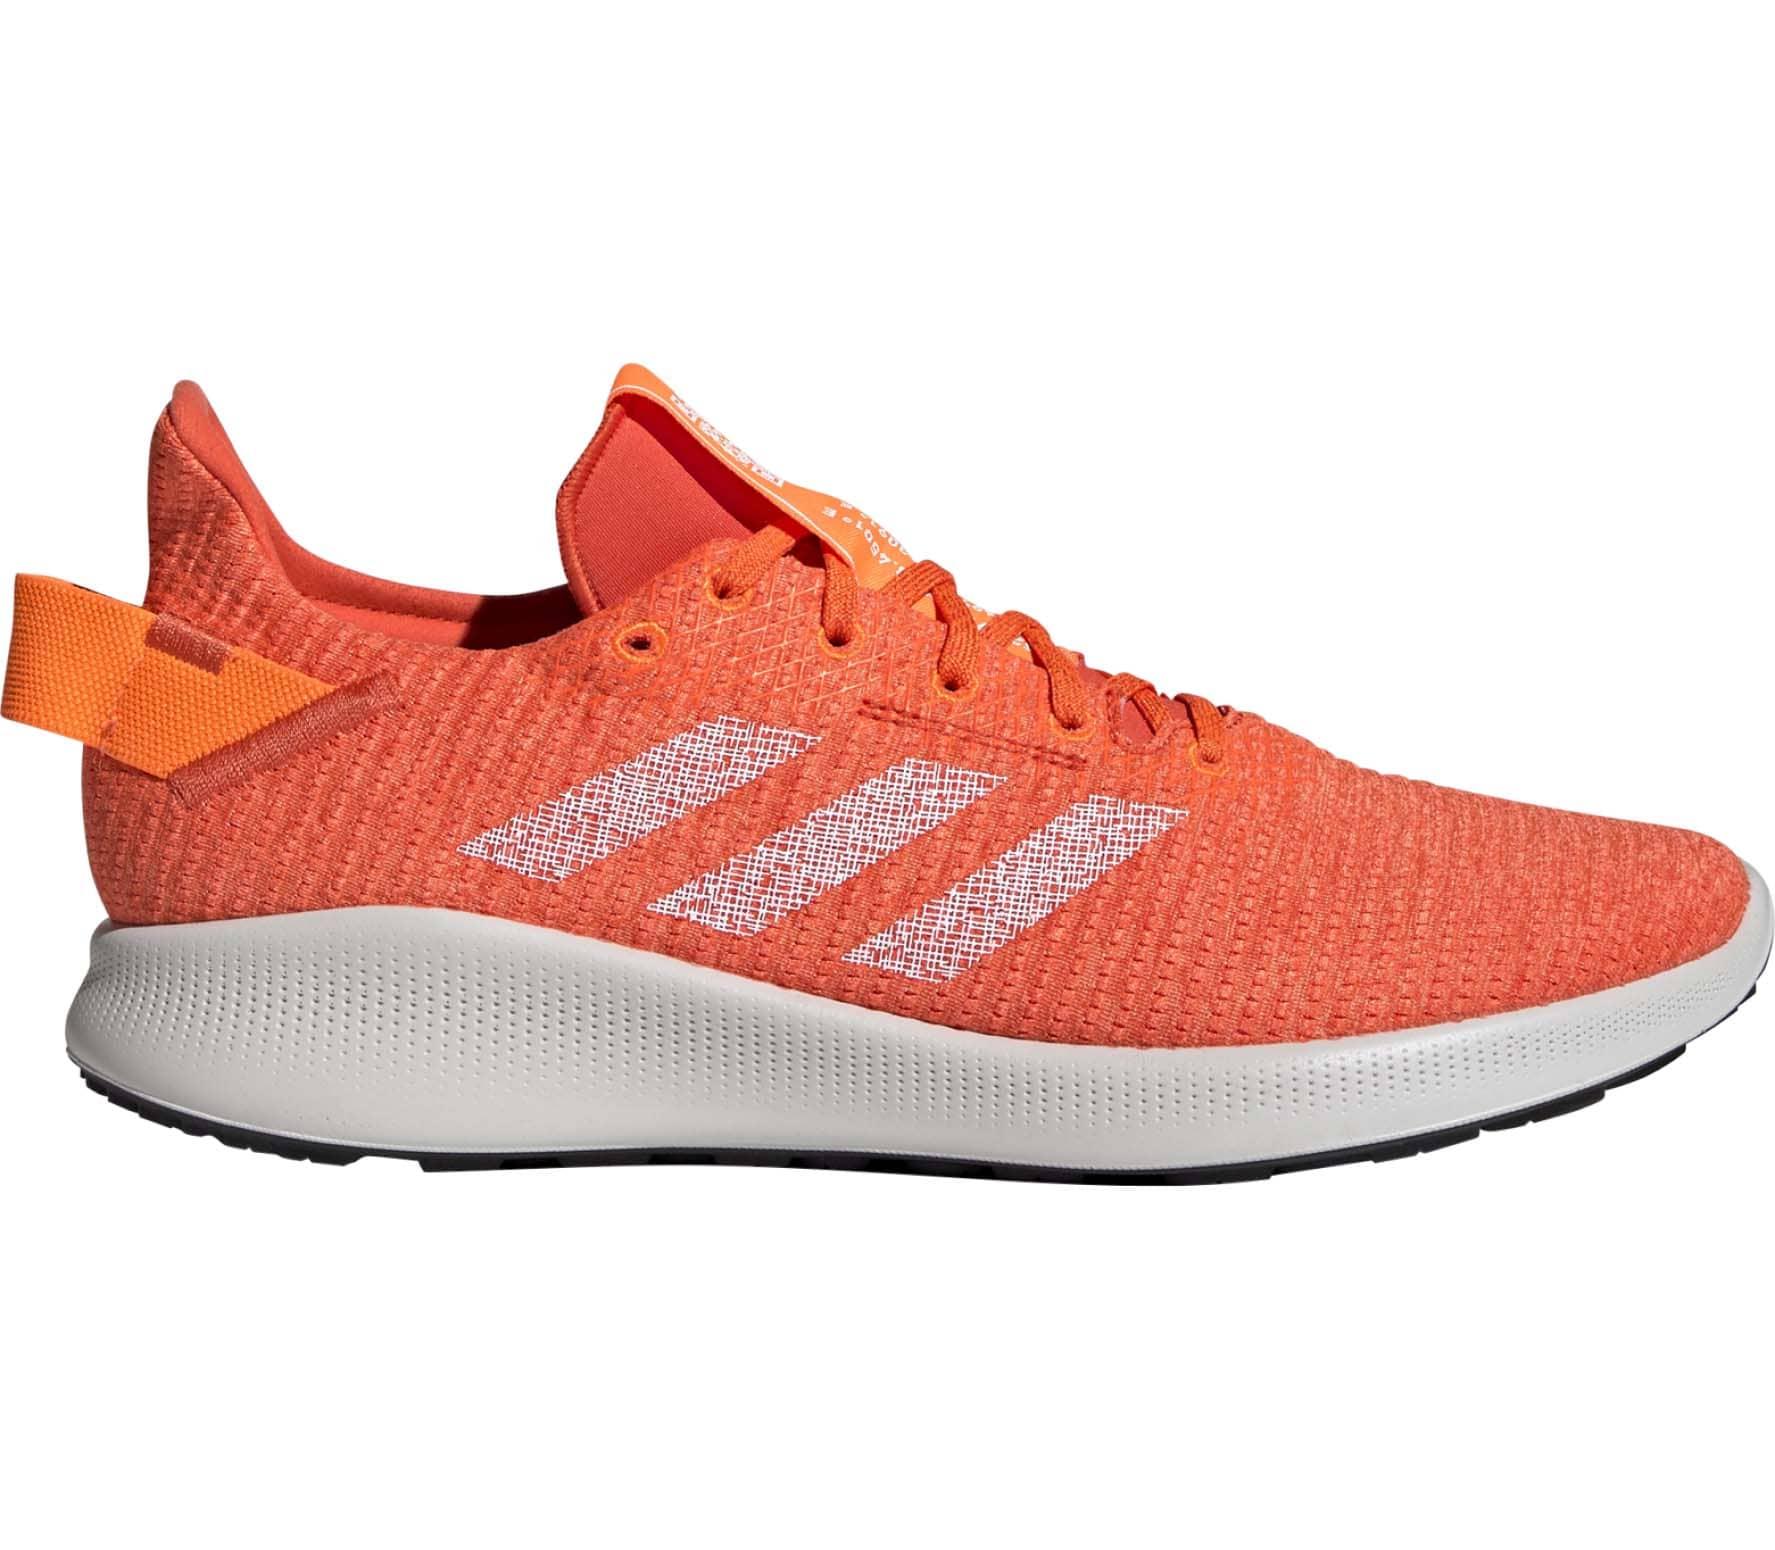 adidas Sensebounce + Street Men Running Shoes  EU 48 - UK 12,5  orange